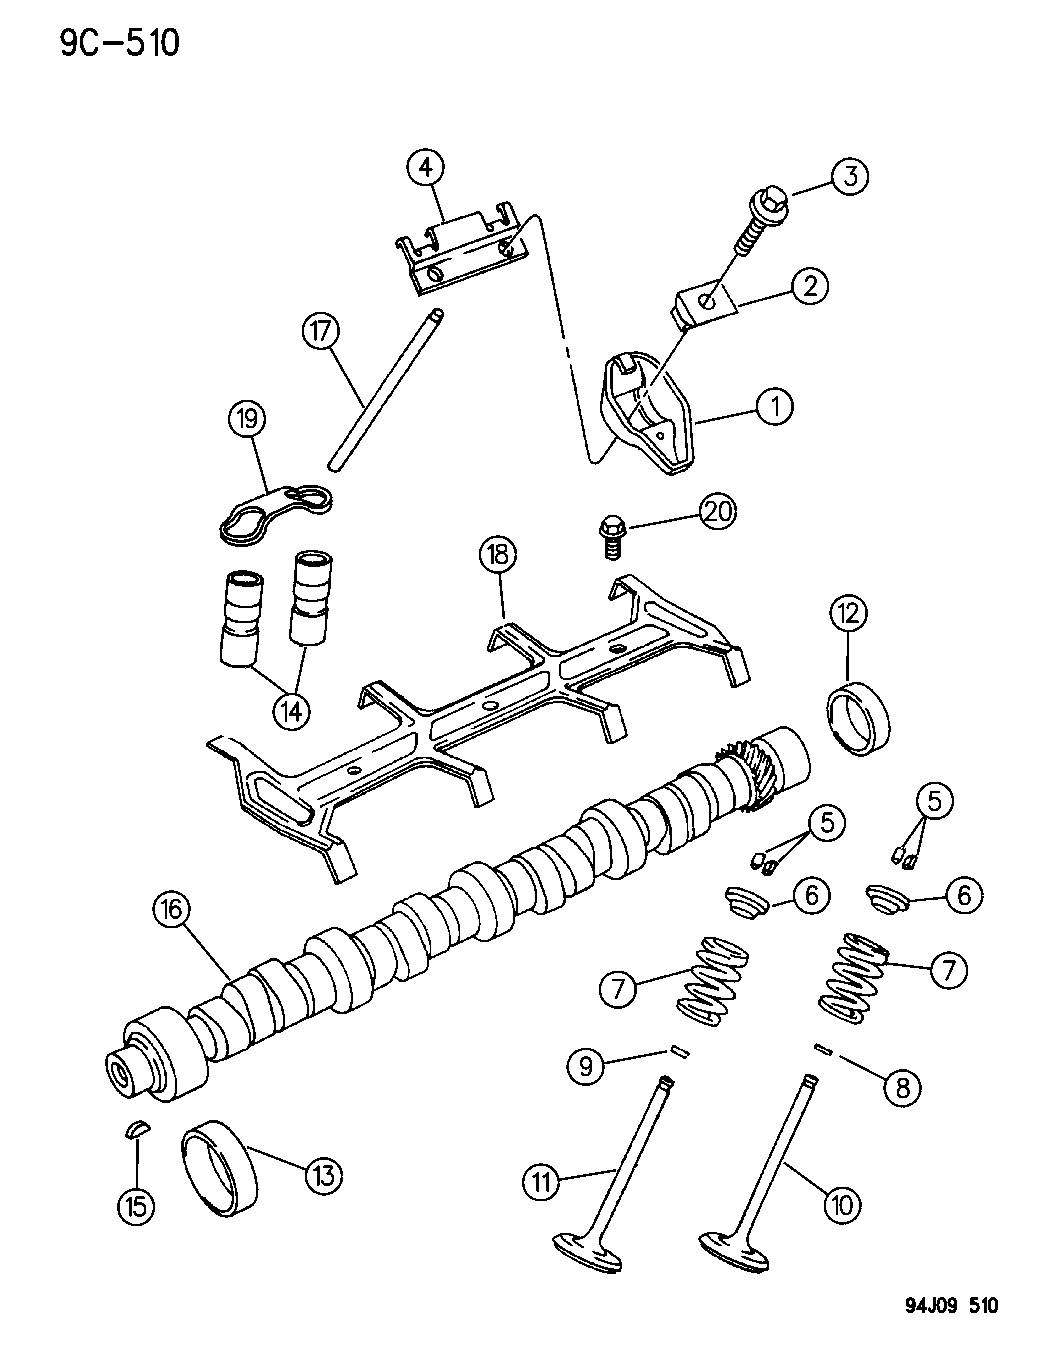 1996 Jeep Grand Cherokee Camshaft & Valves - Thumbnail 1